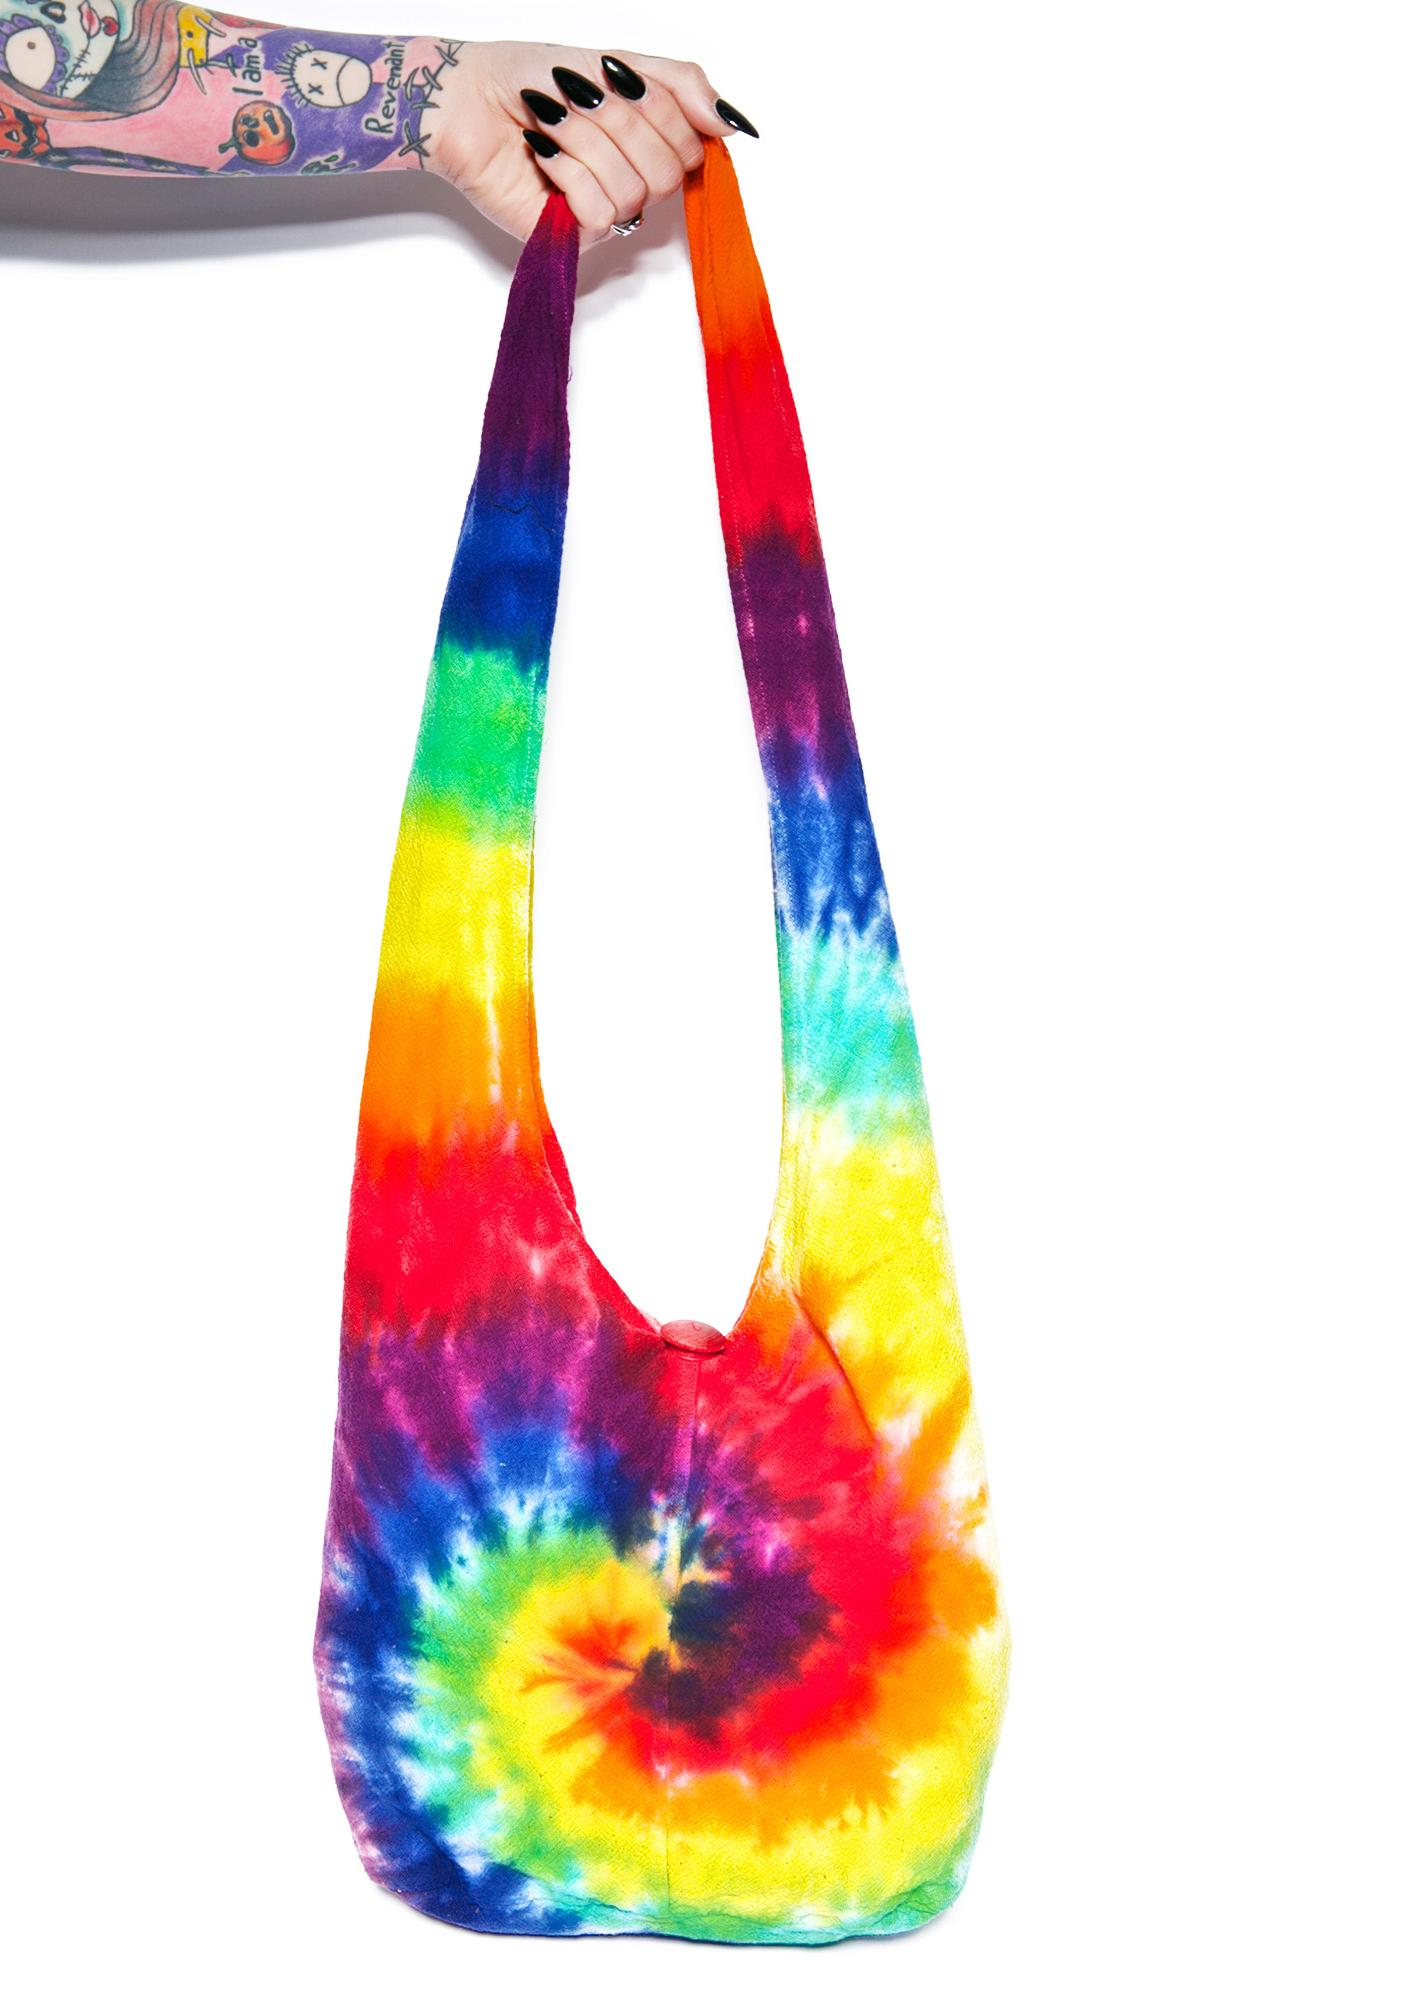 Spun Out Shoulder Bag